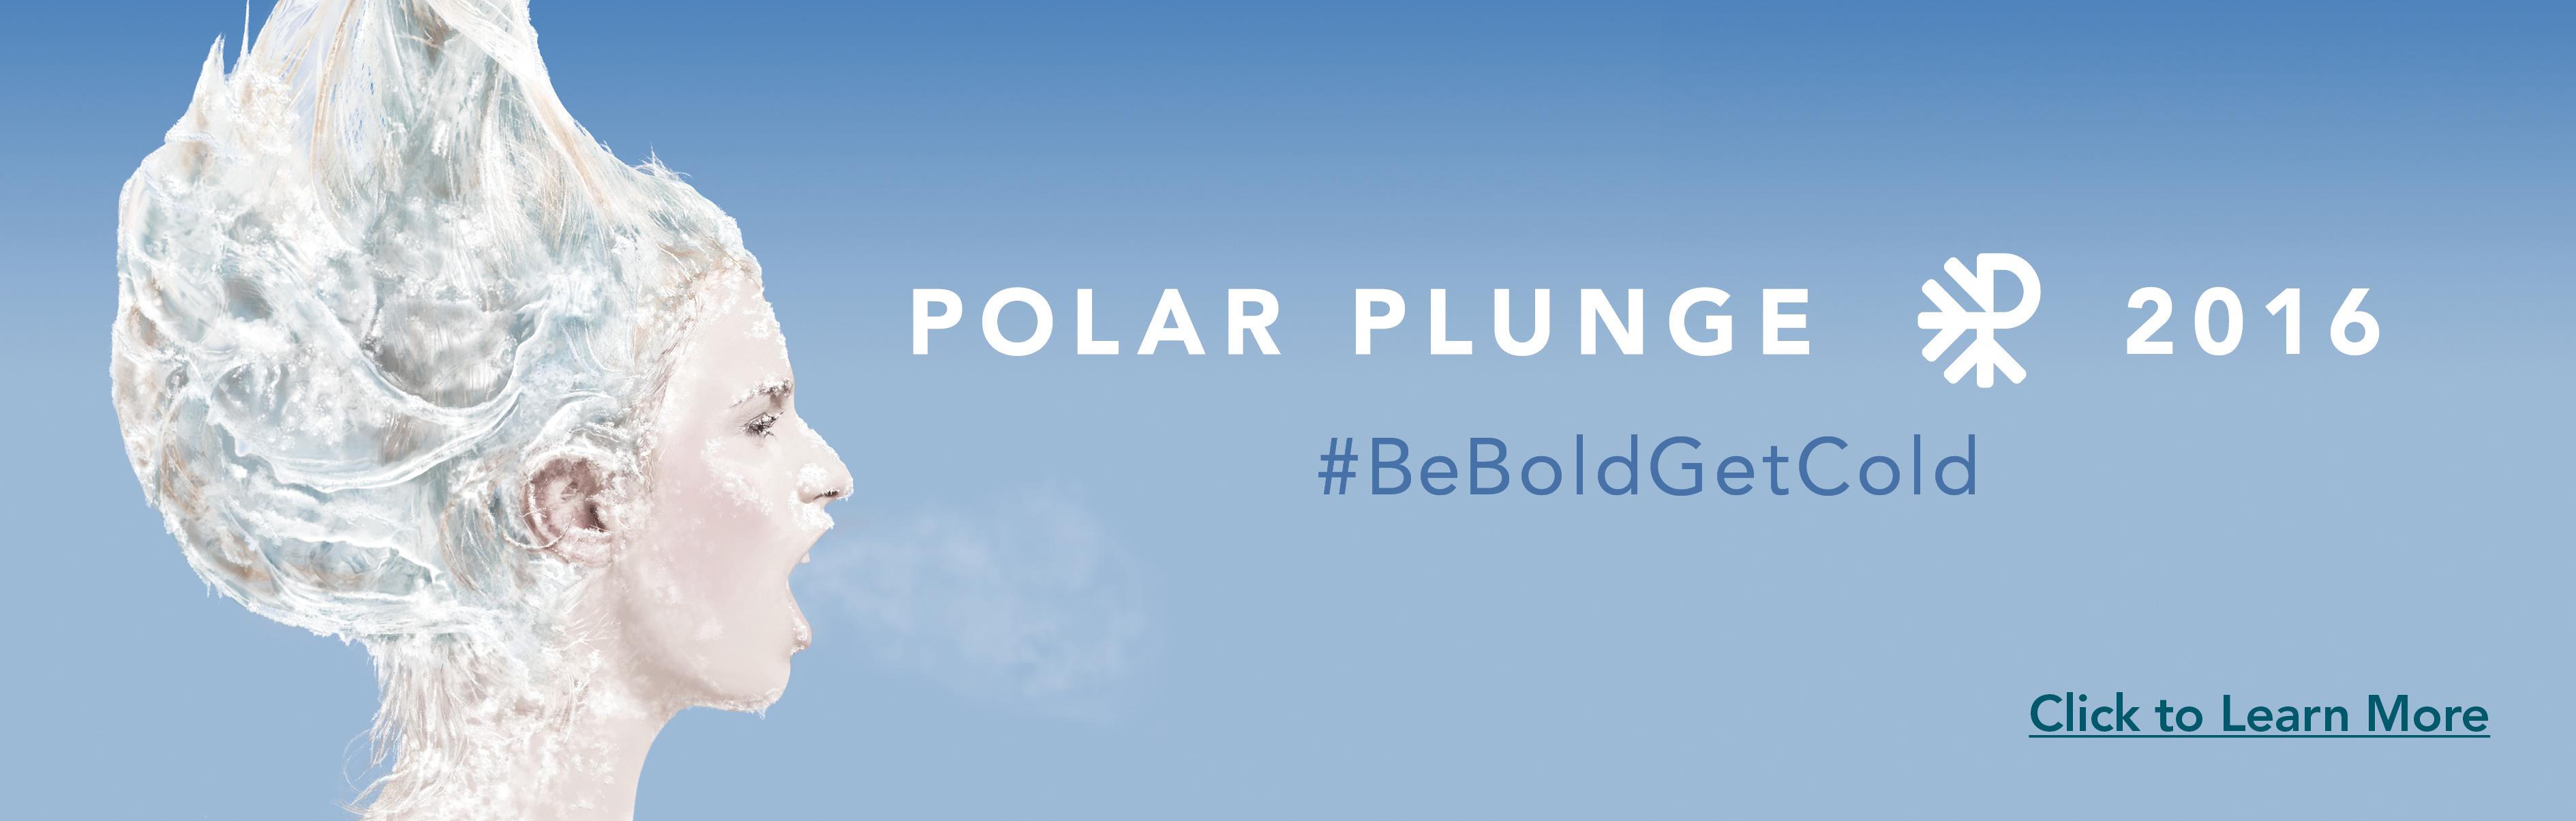 Polar Plunge 2016 JQ